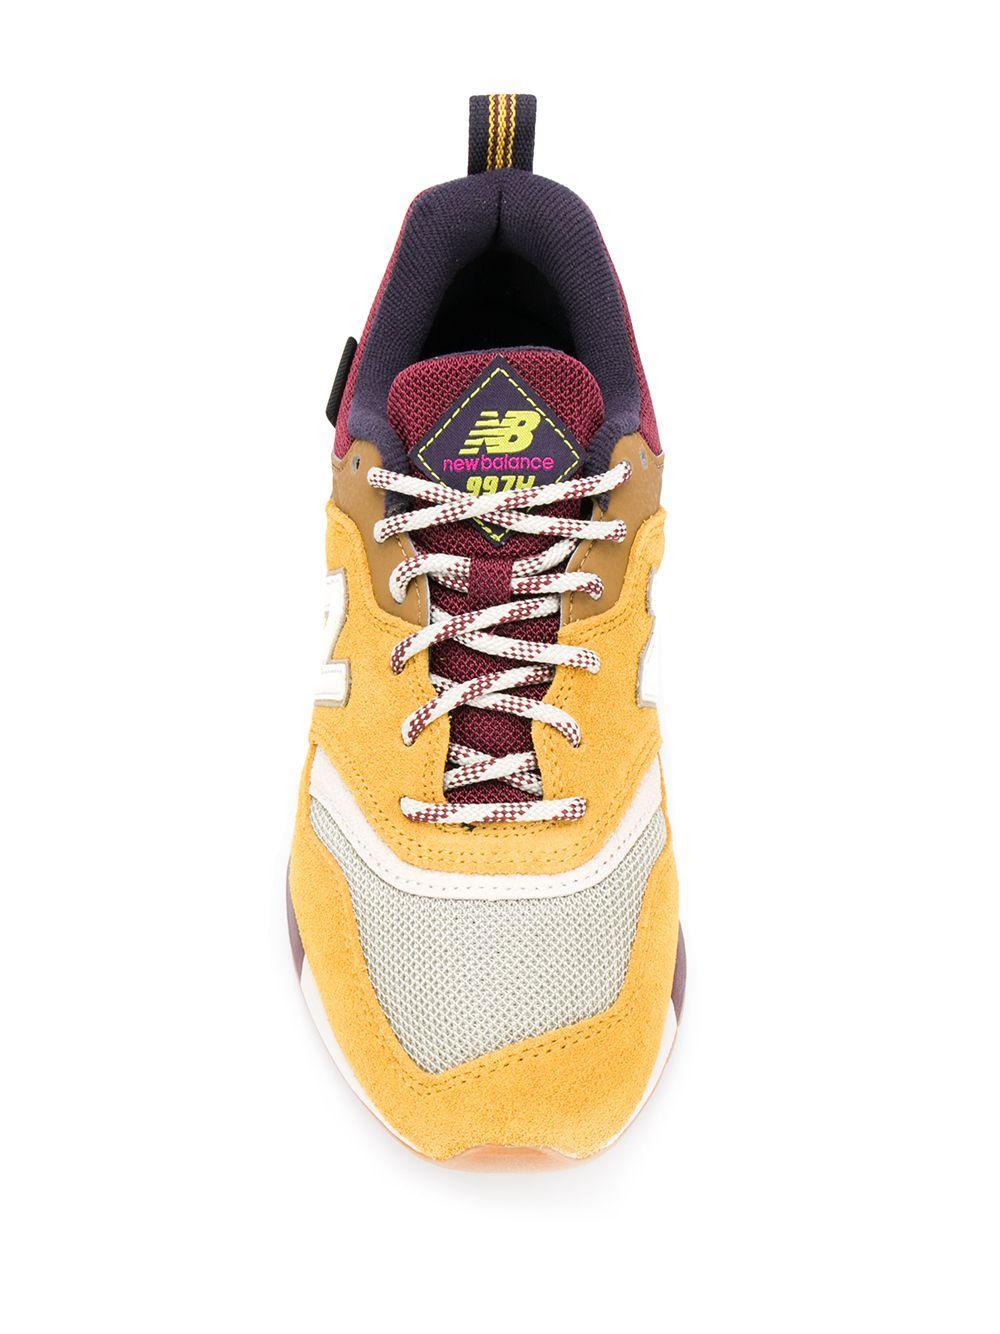 new balance 997h yellow